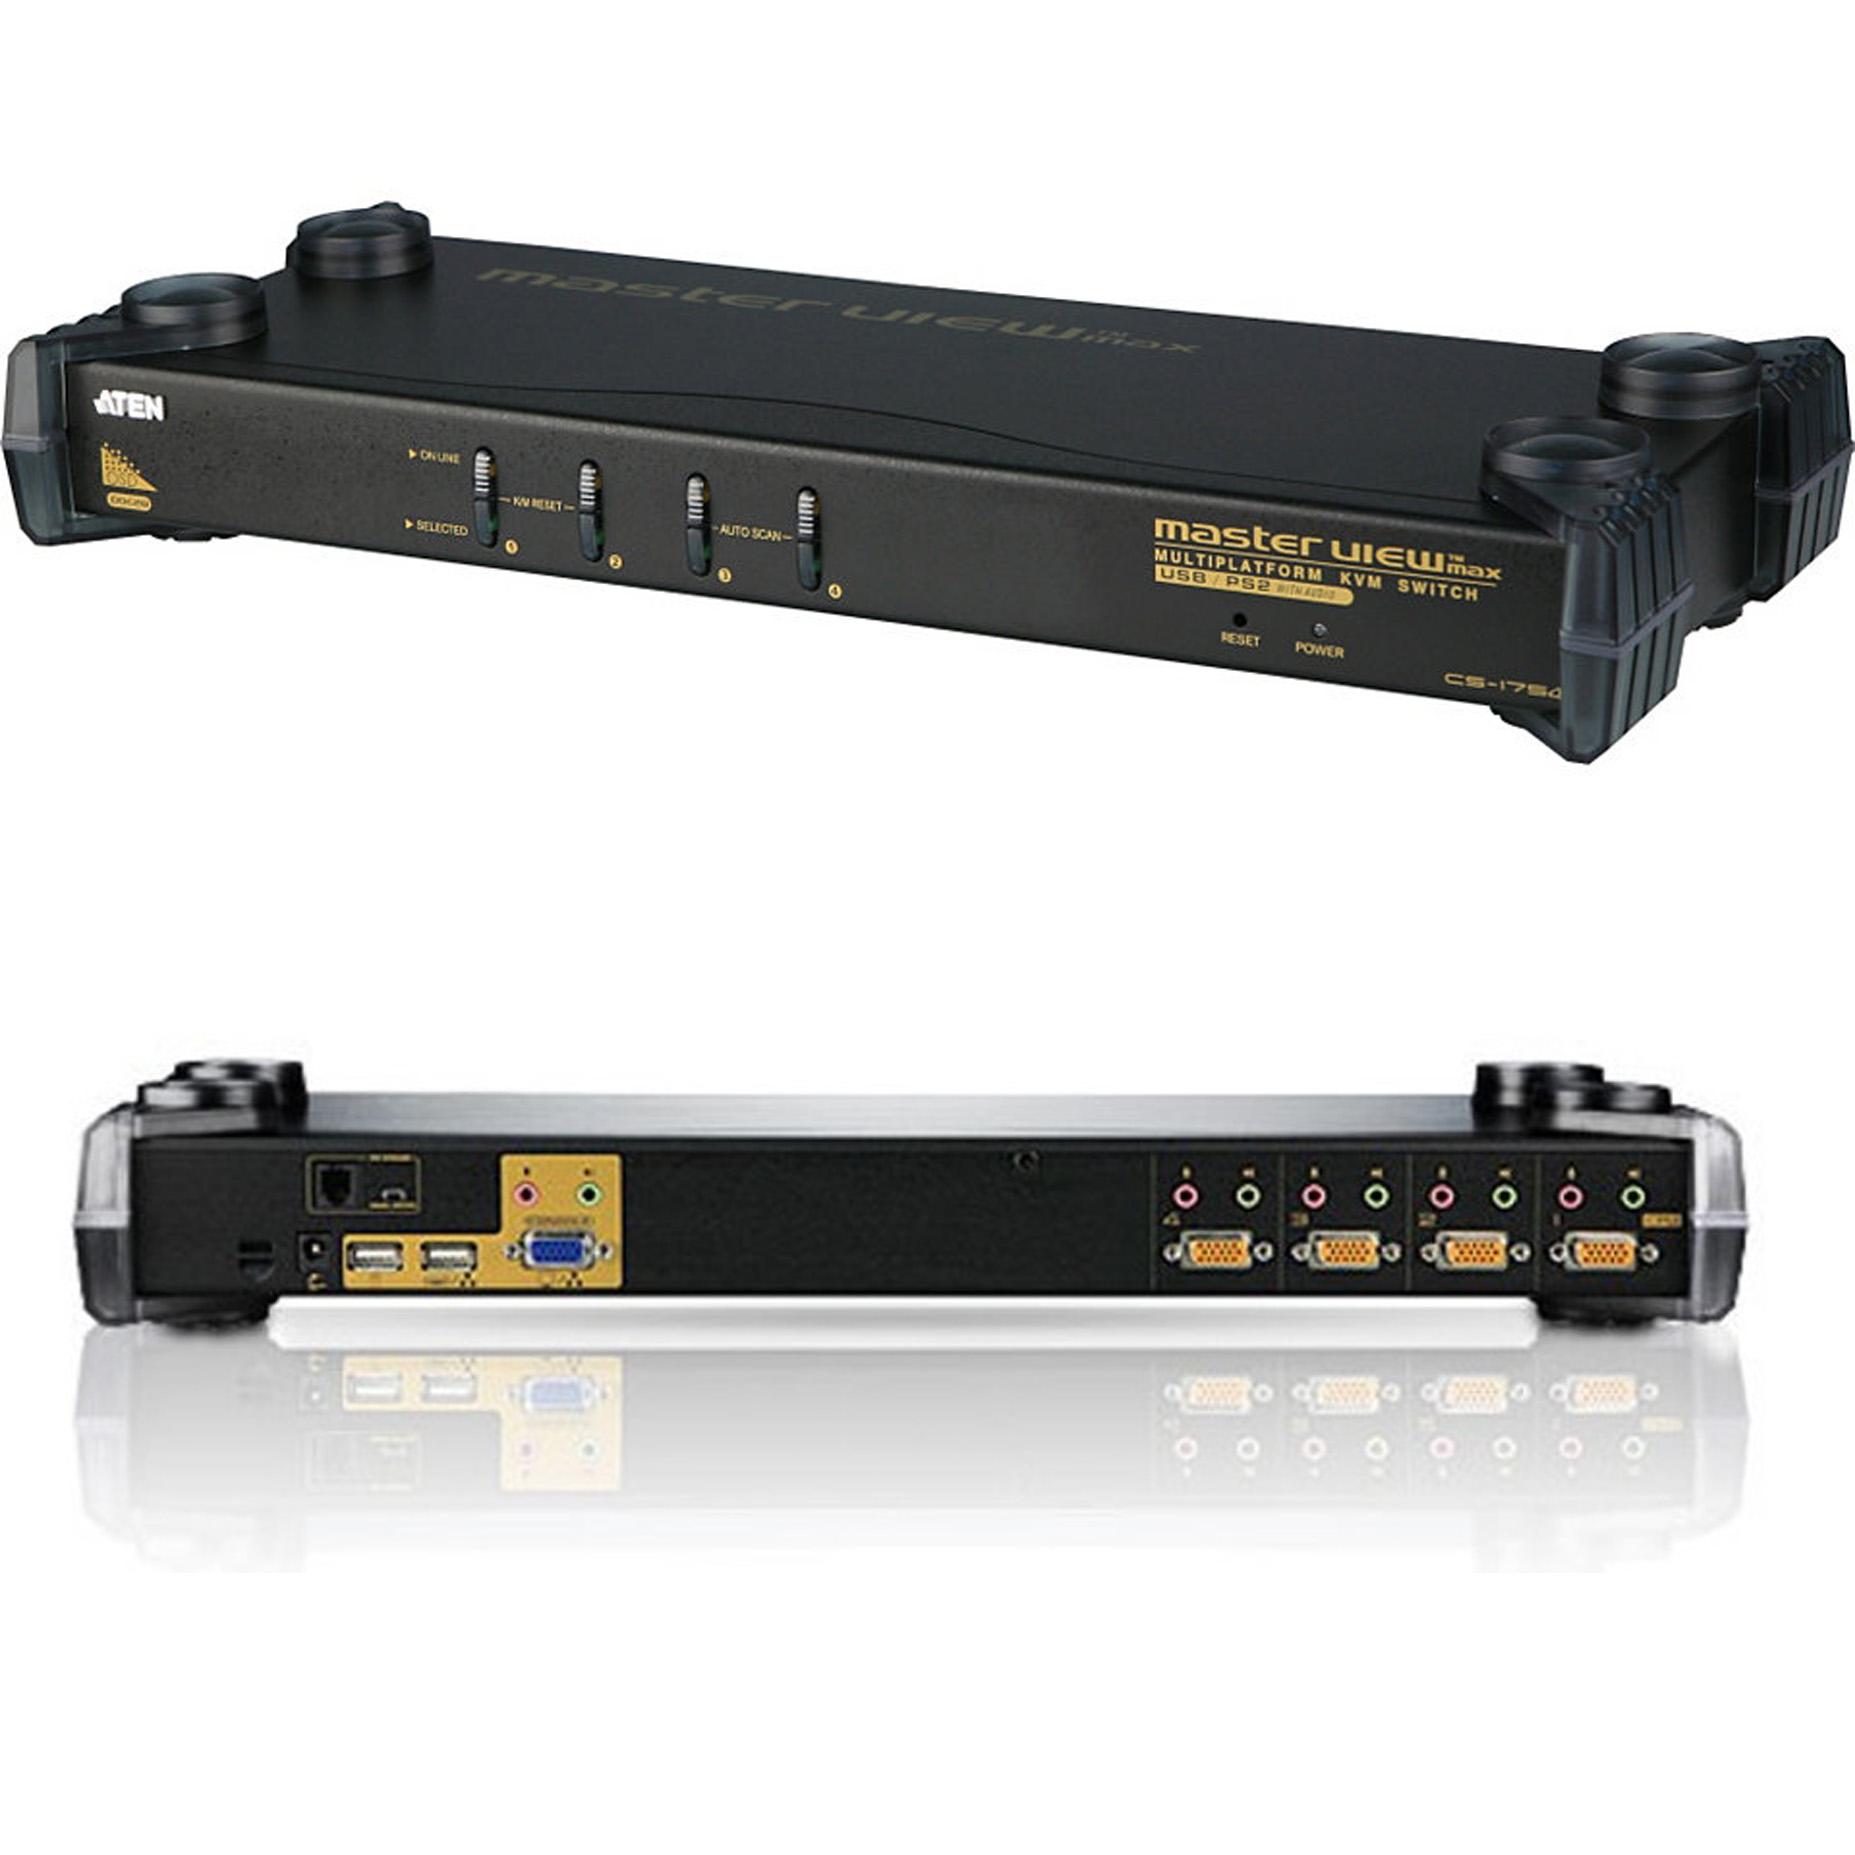 Harga Aten CS1754 Q9 4-Port PS2-USB Switch KVM